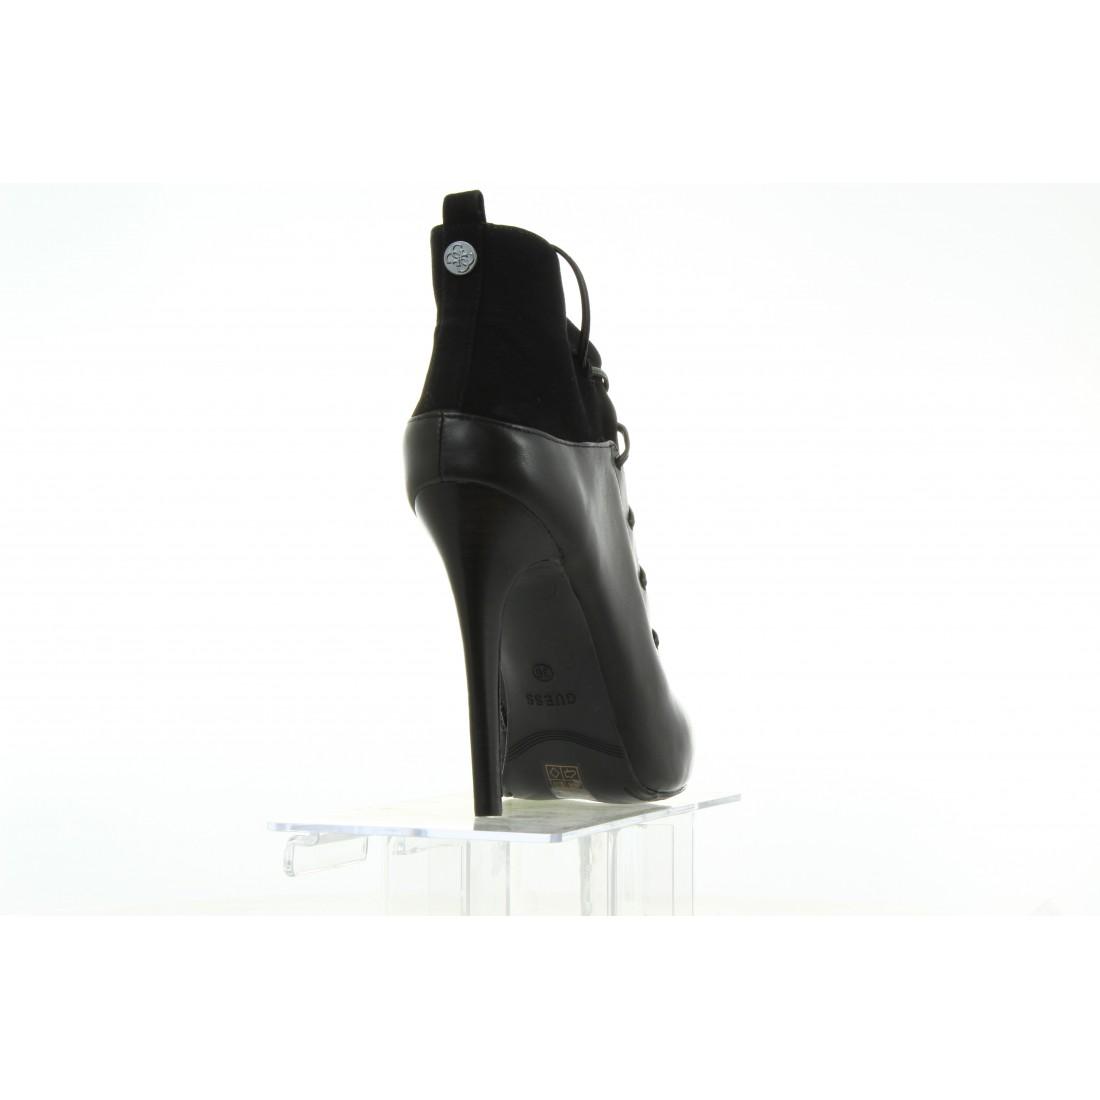 FLSID4 LEA09 BLACK Czarny